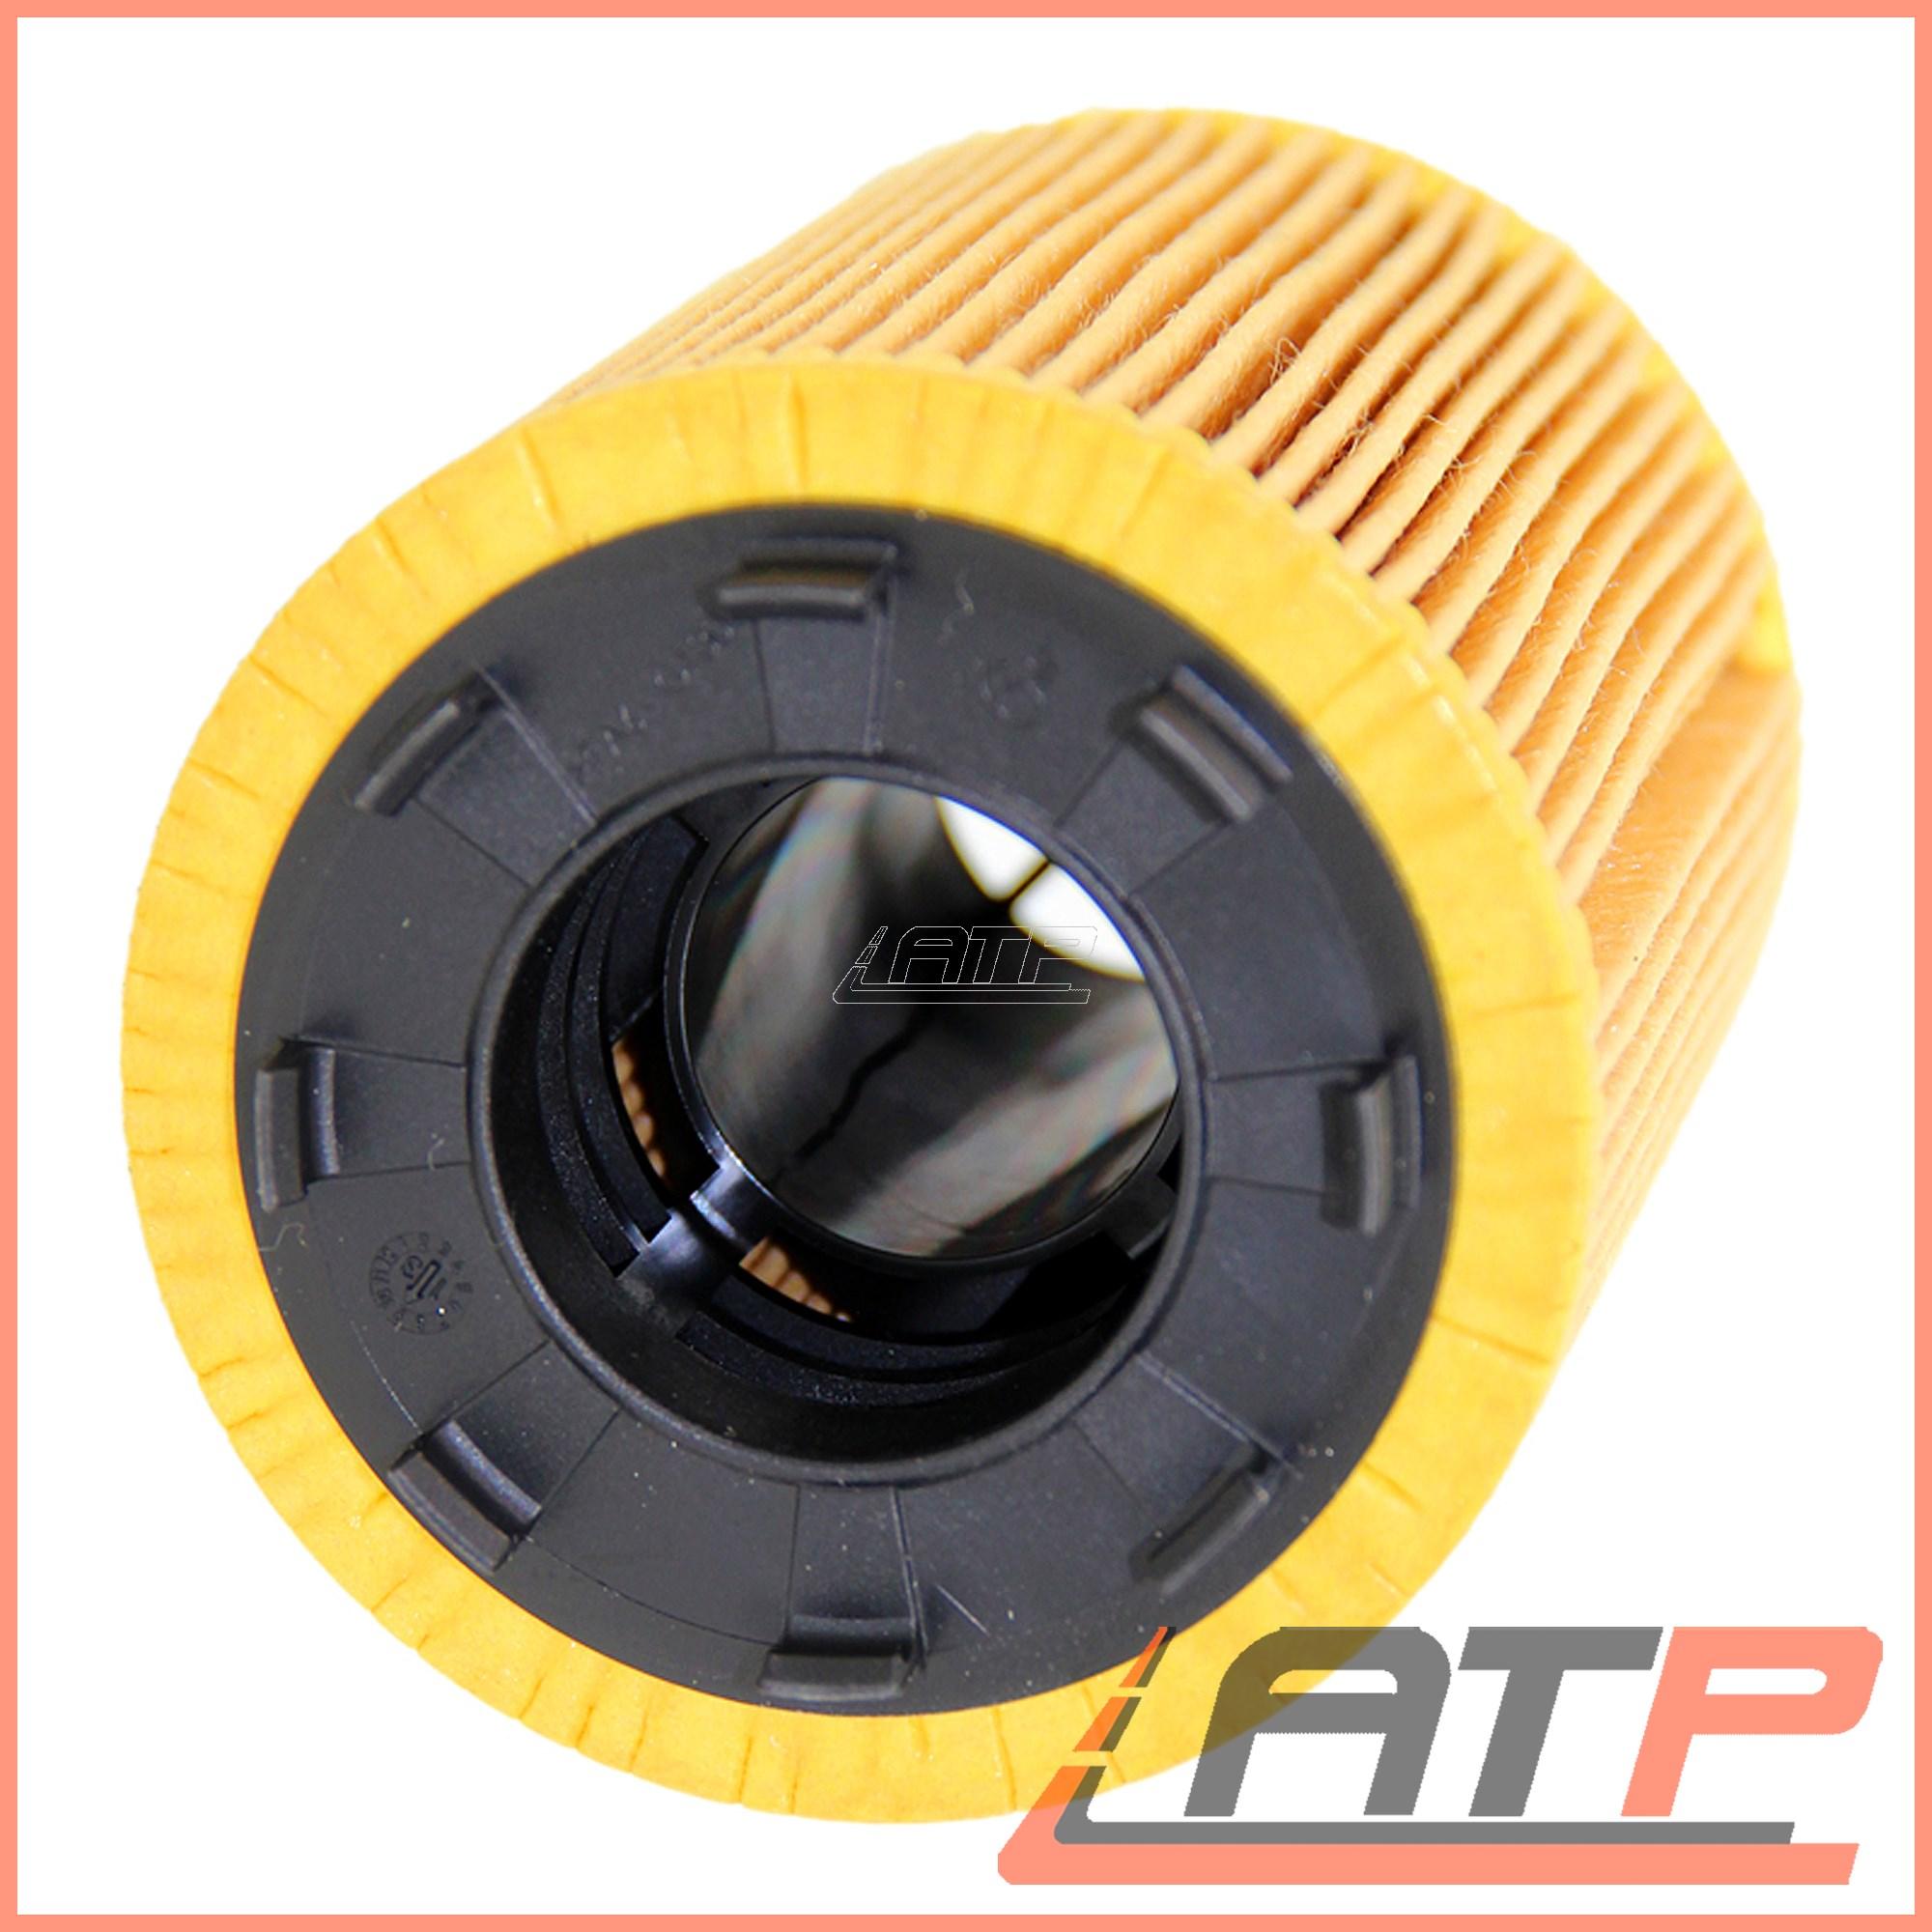 Millennium-Filters MN-PISV24A80W Direct Interchange for Taisei-Kogyo-PISV24A80W Stainless Steel Millennium Filters